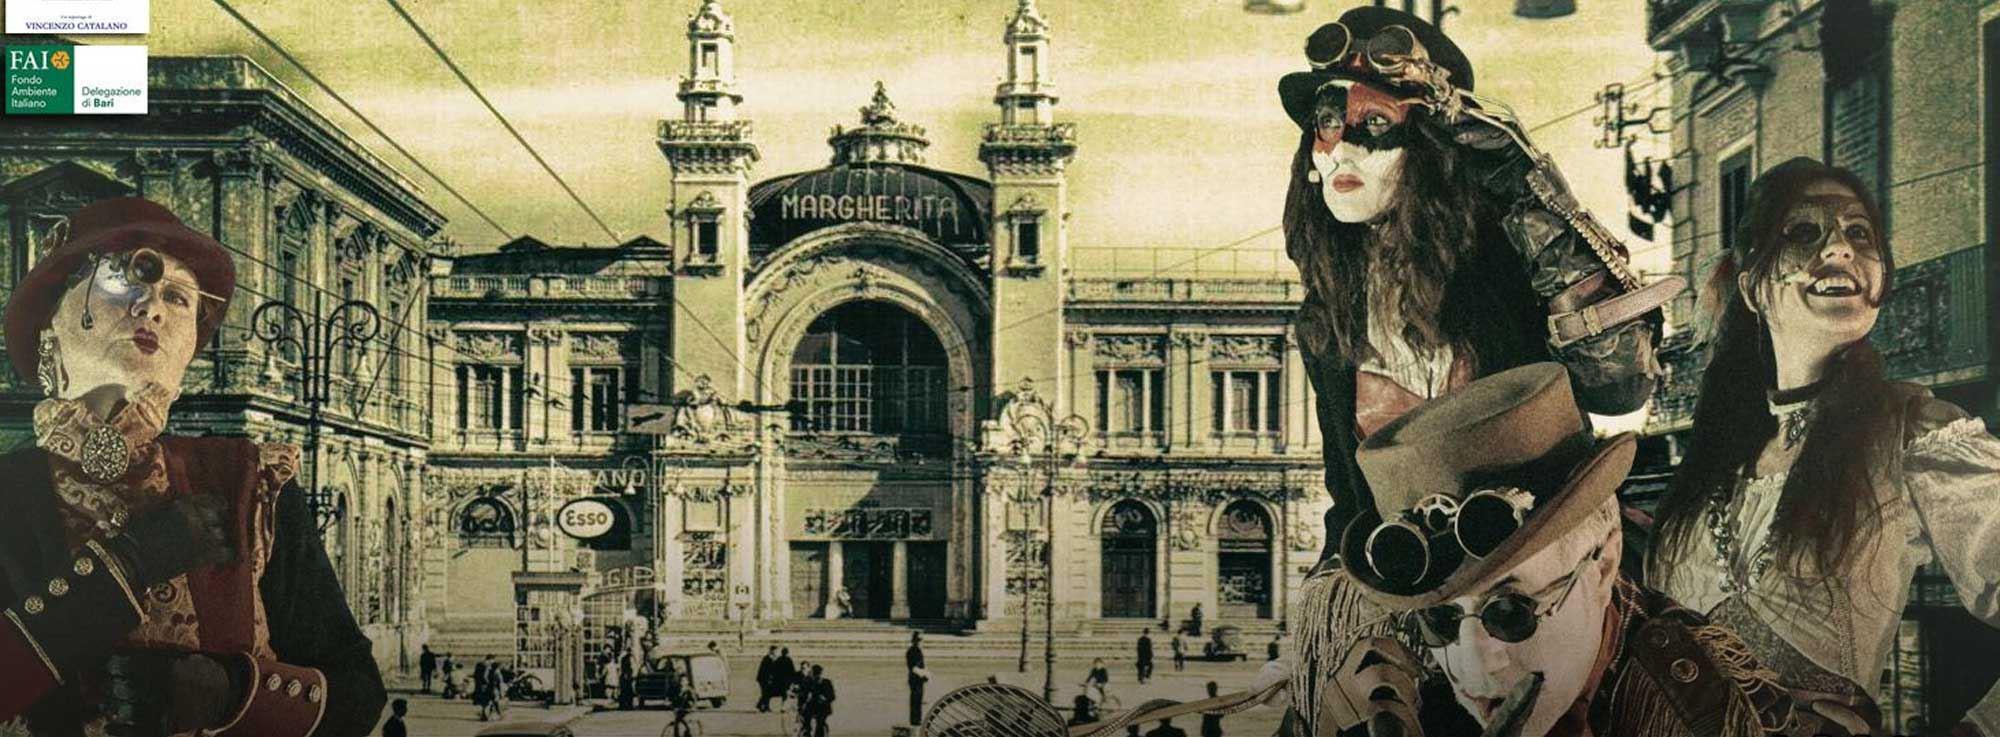 Bari: Happy Steamdead, Mr. King